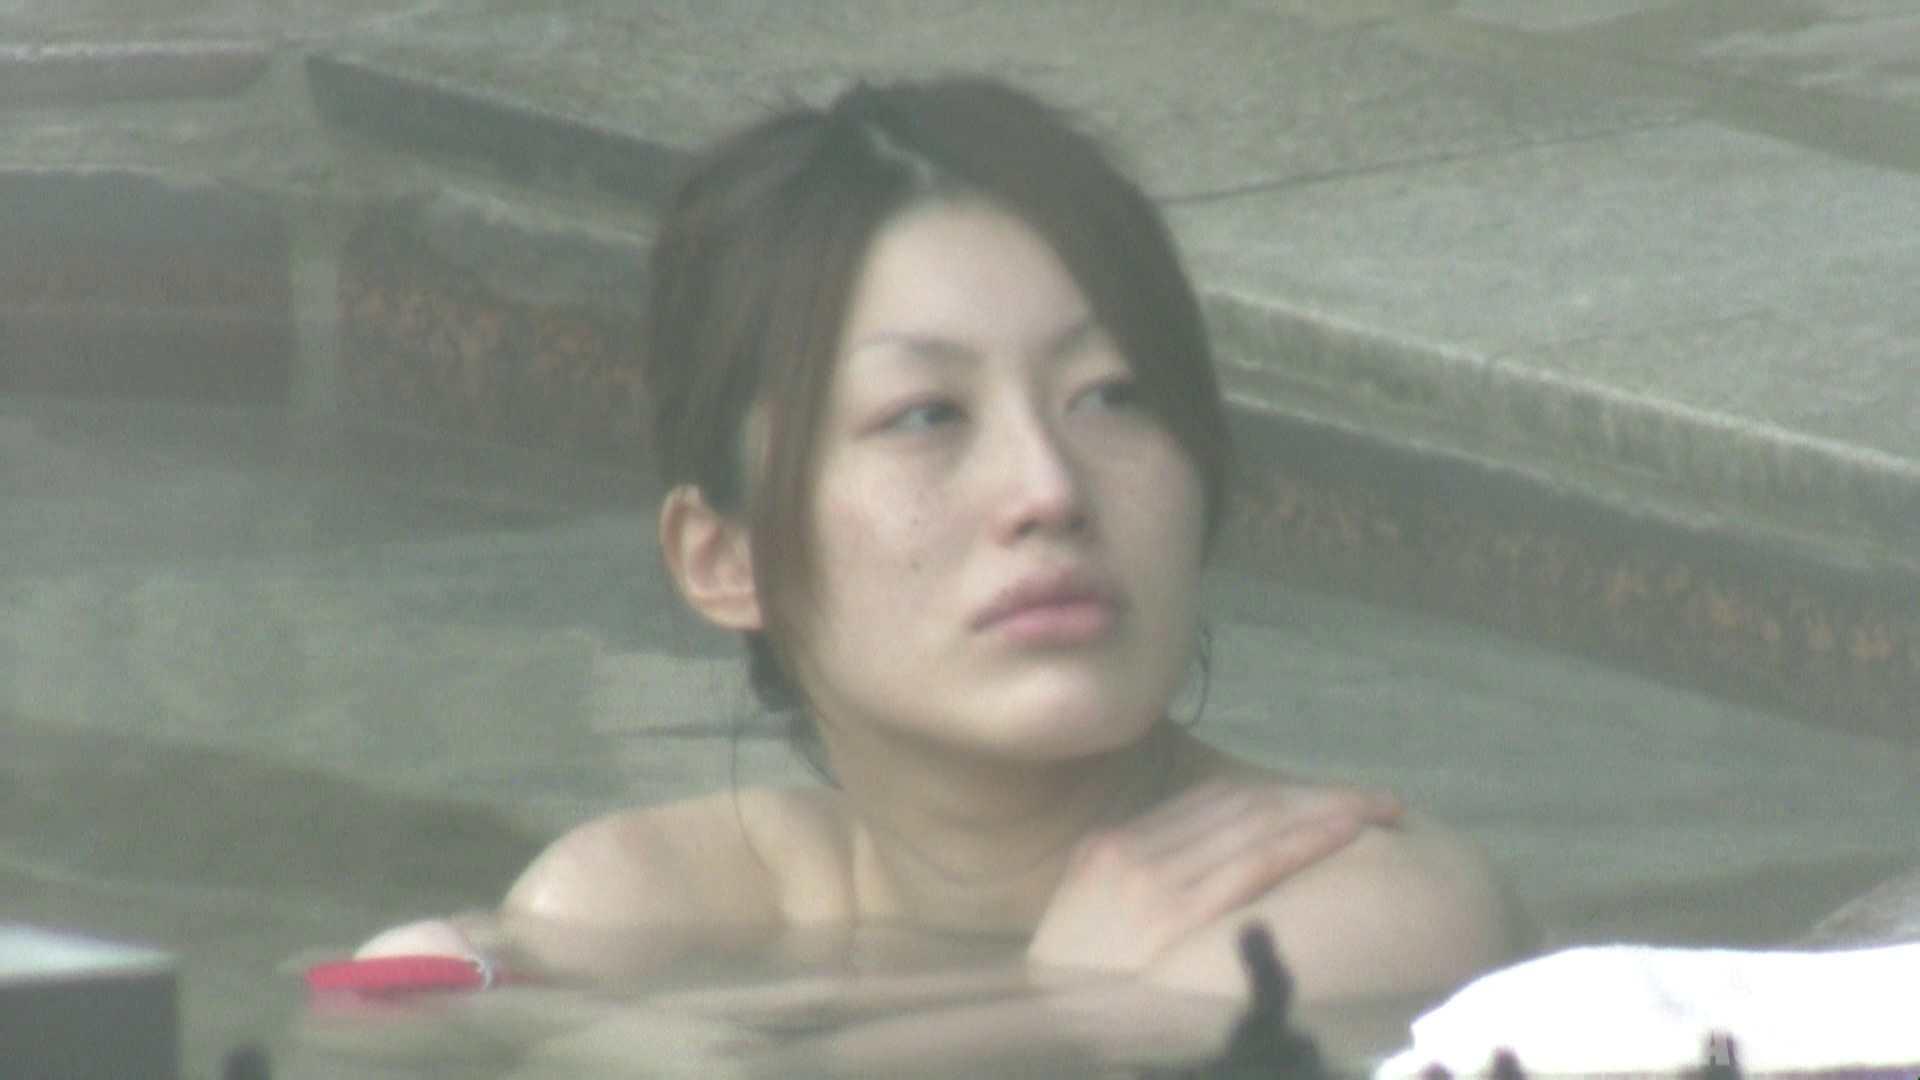 Aquaな露天風呂Vol.775 盗撮映像  74Pix 23